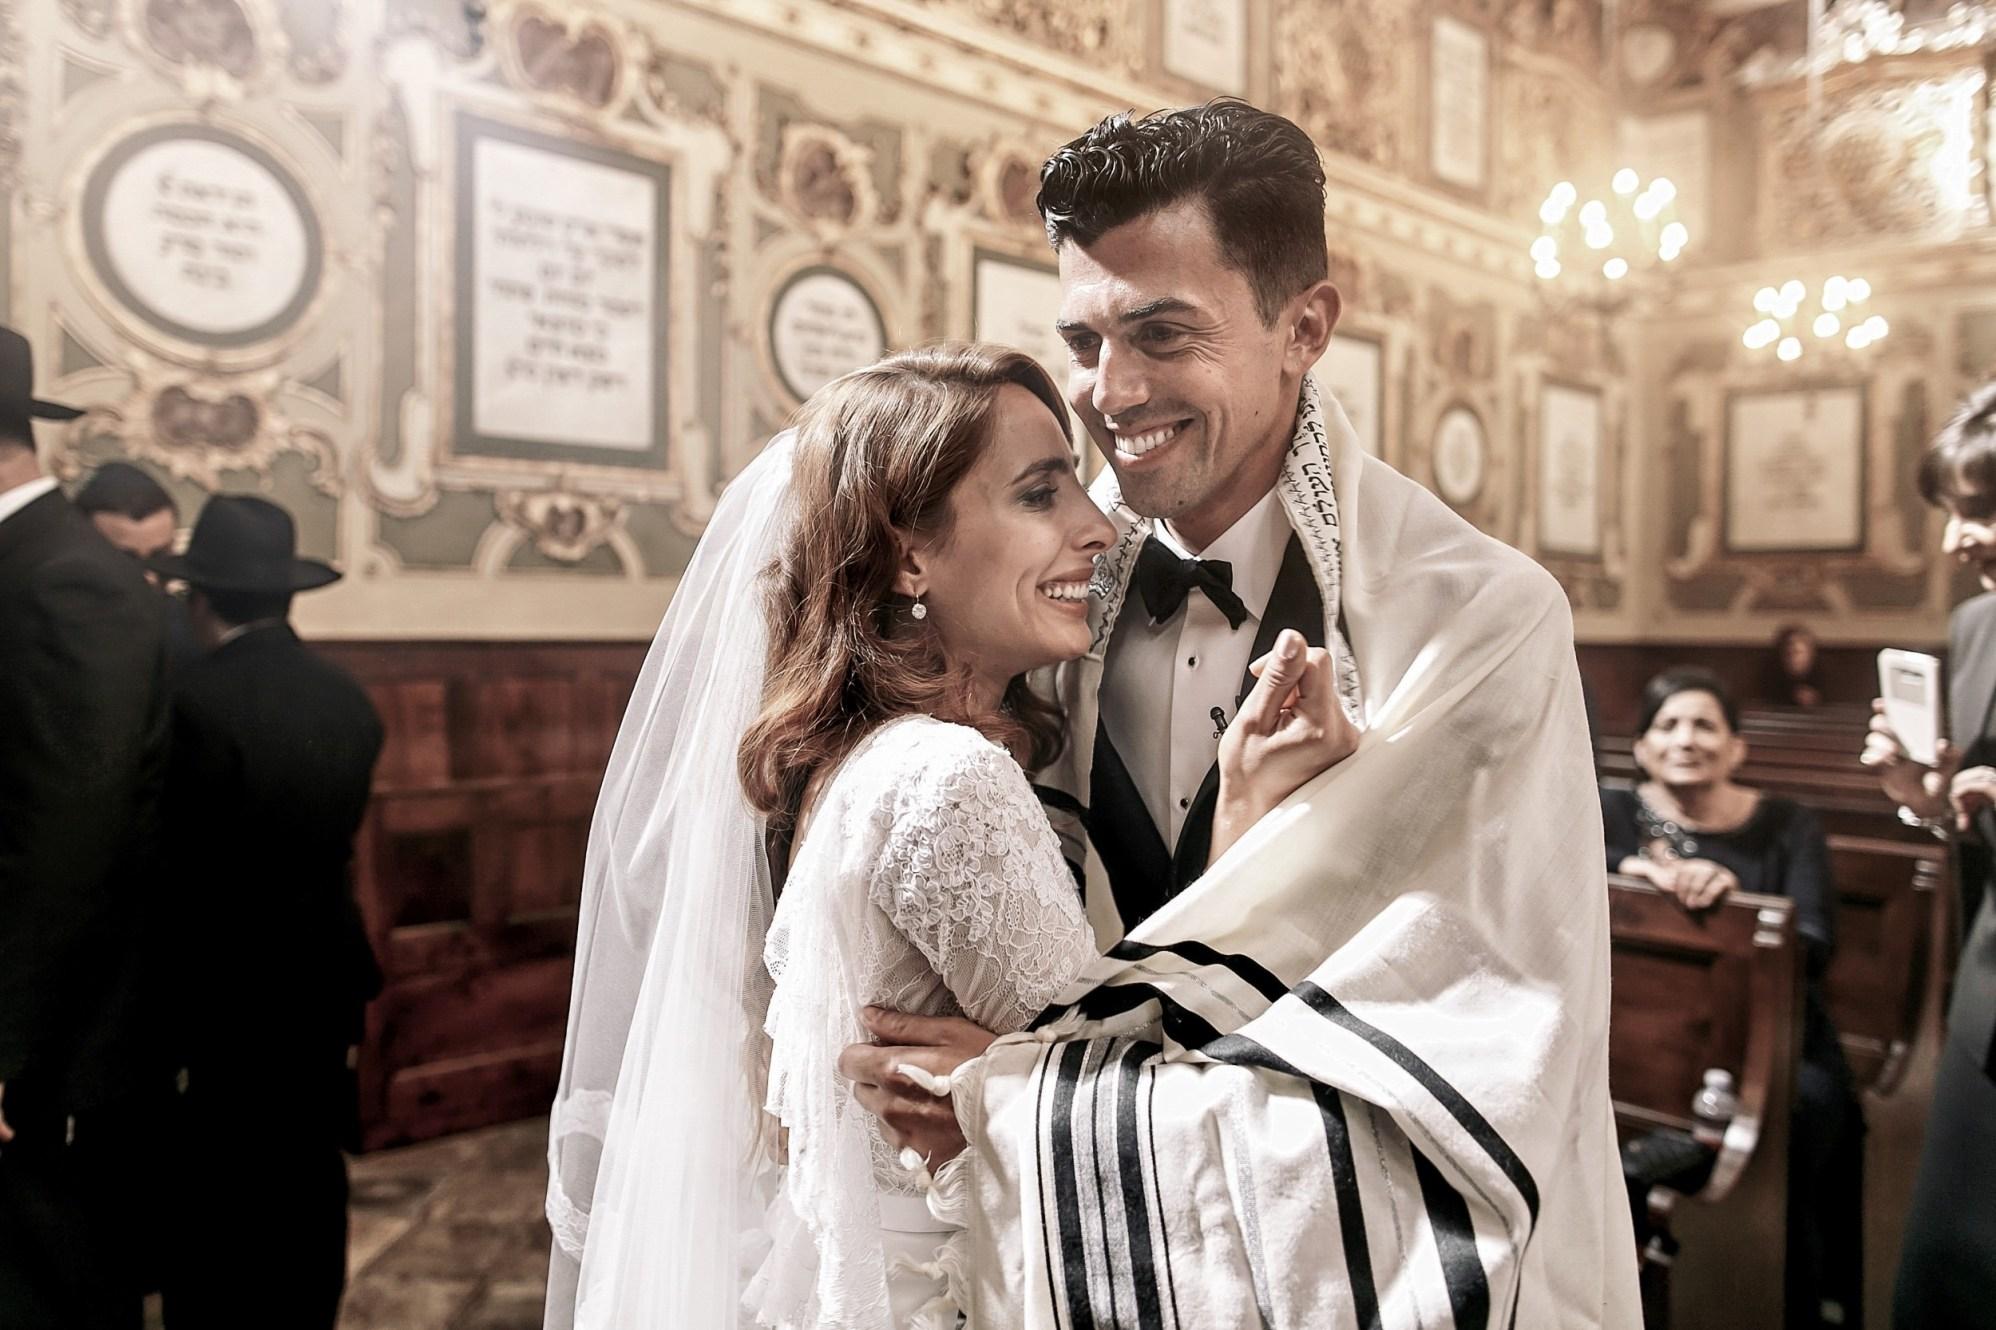 JEWISH WEDDING ART PHOTOGRAPHY 009301 (Custom)